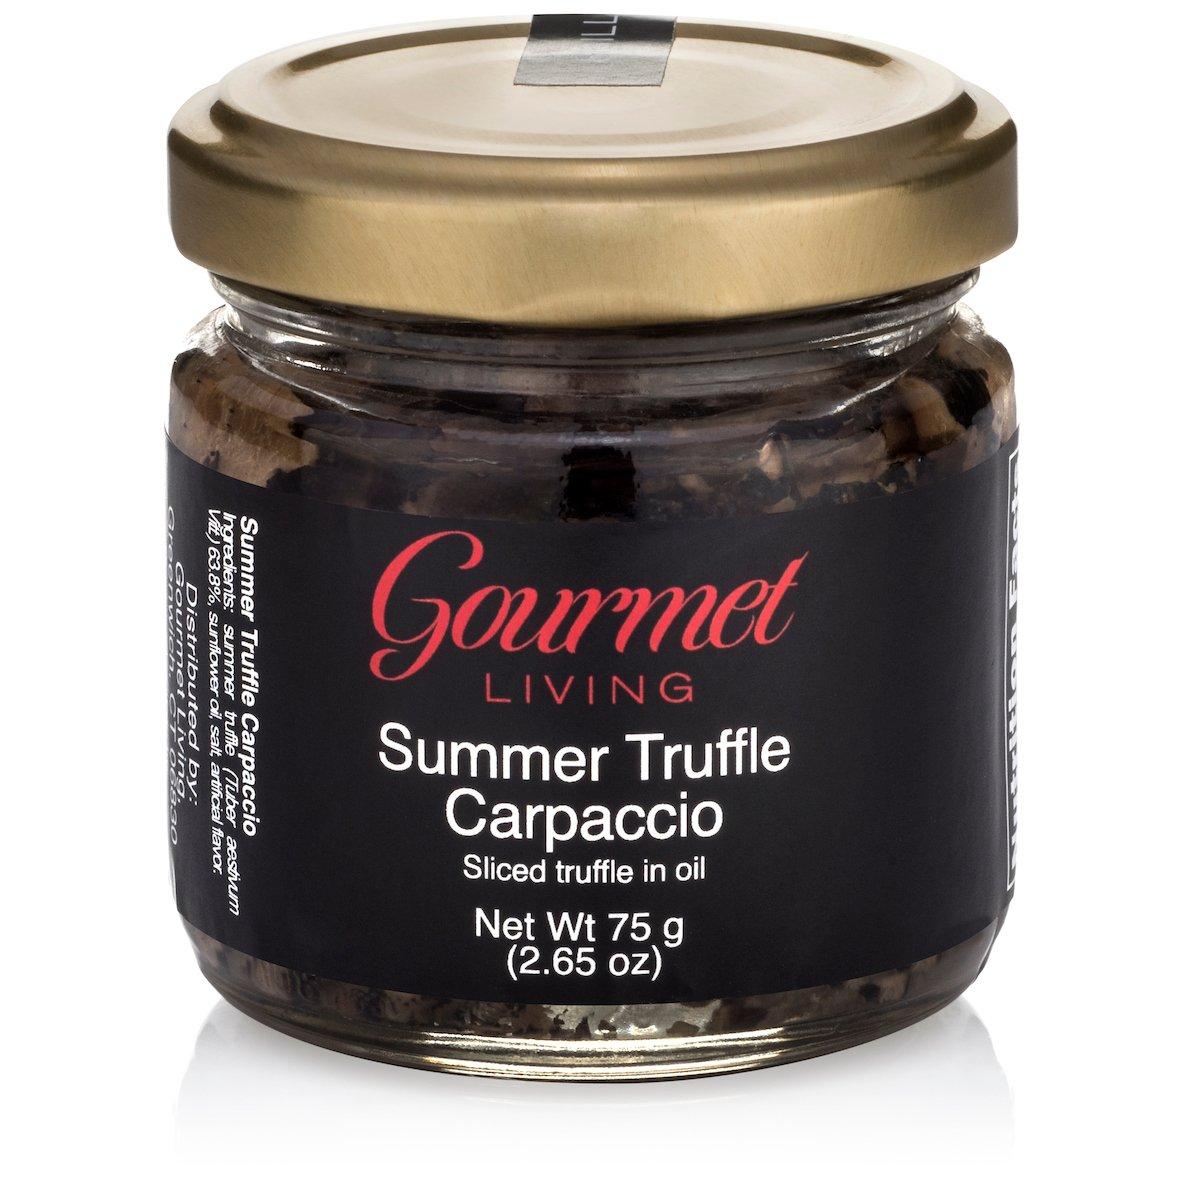 Gourmet Living Summer Truffle Mushroom Carpaccio | Slices of Italian Truffles in Sunflower Oil 2.65oz